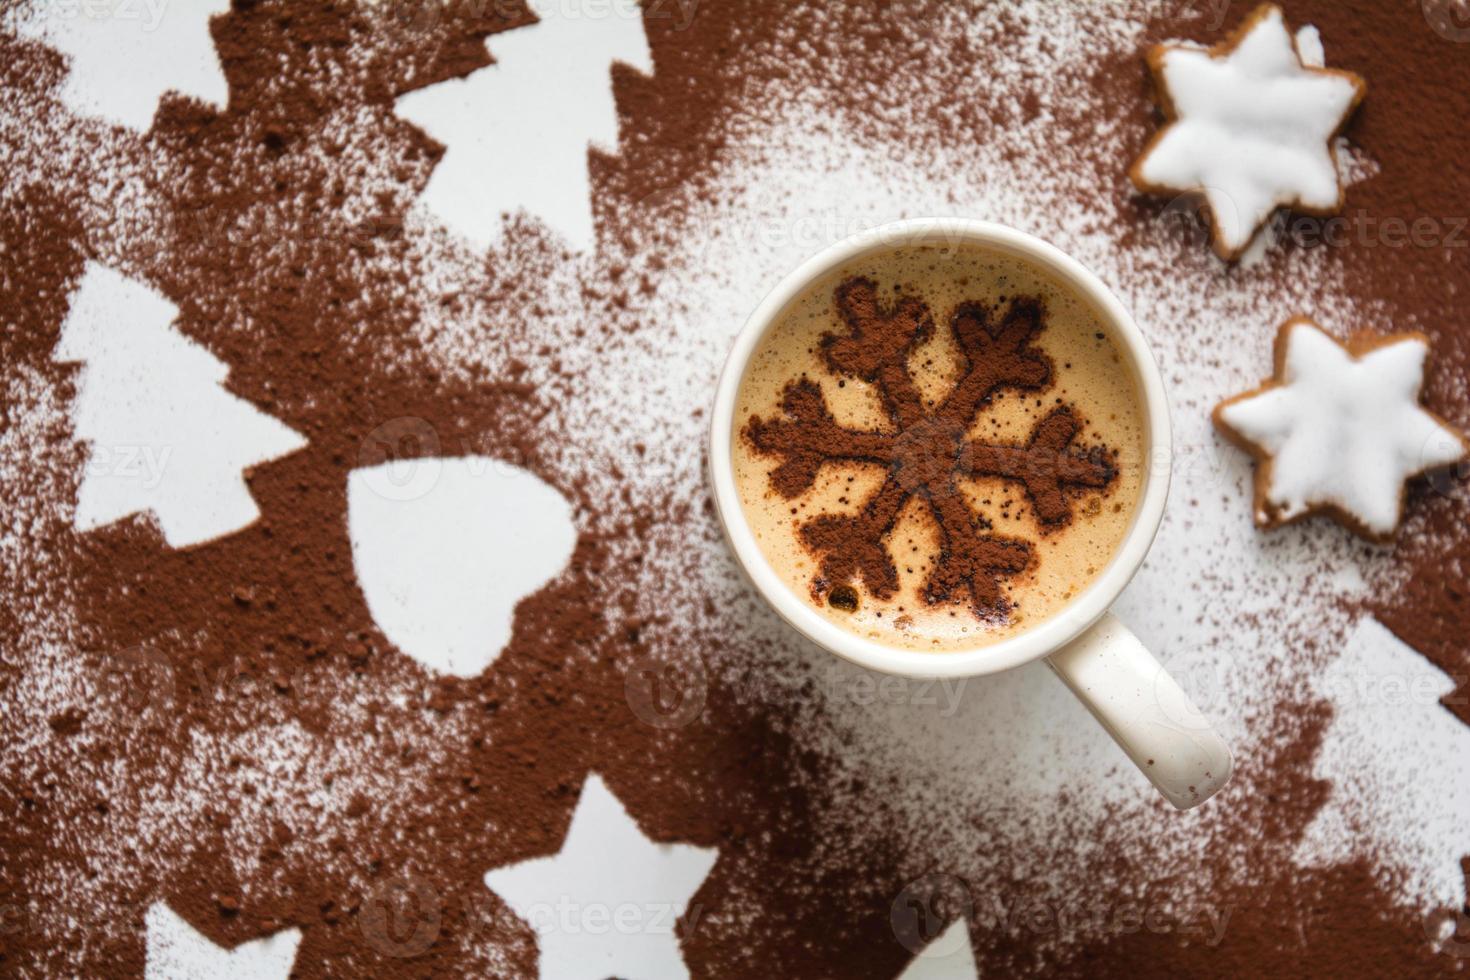 warme drank met cacaosneeuwvlok foto